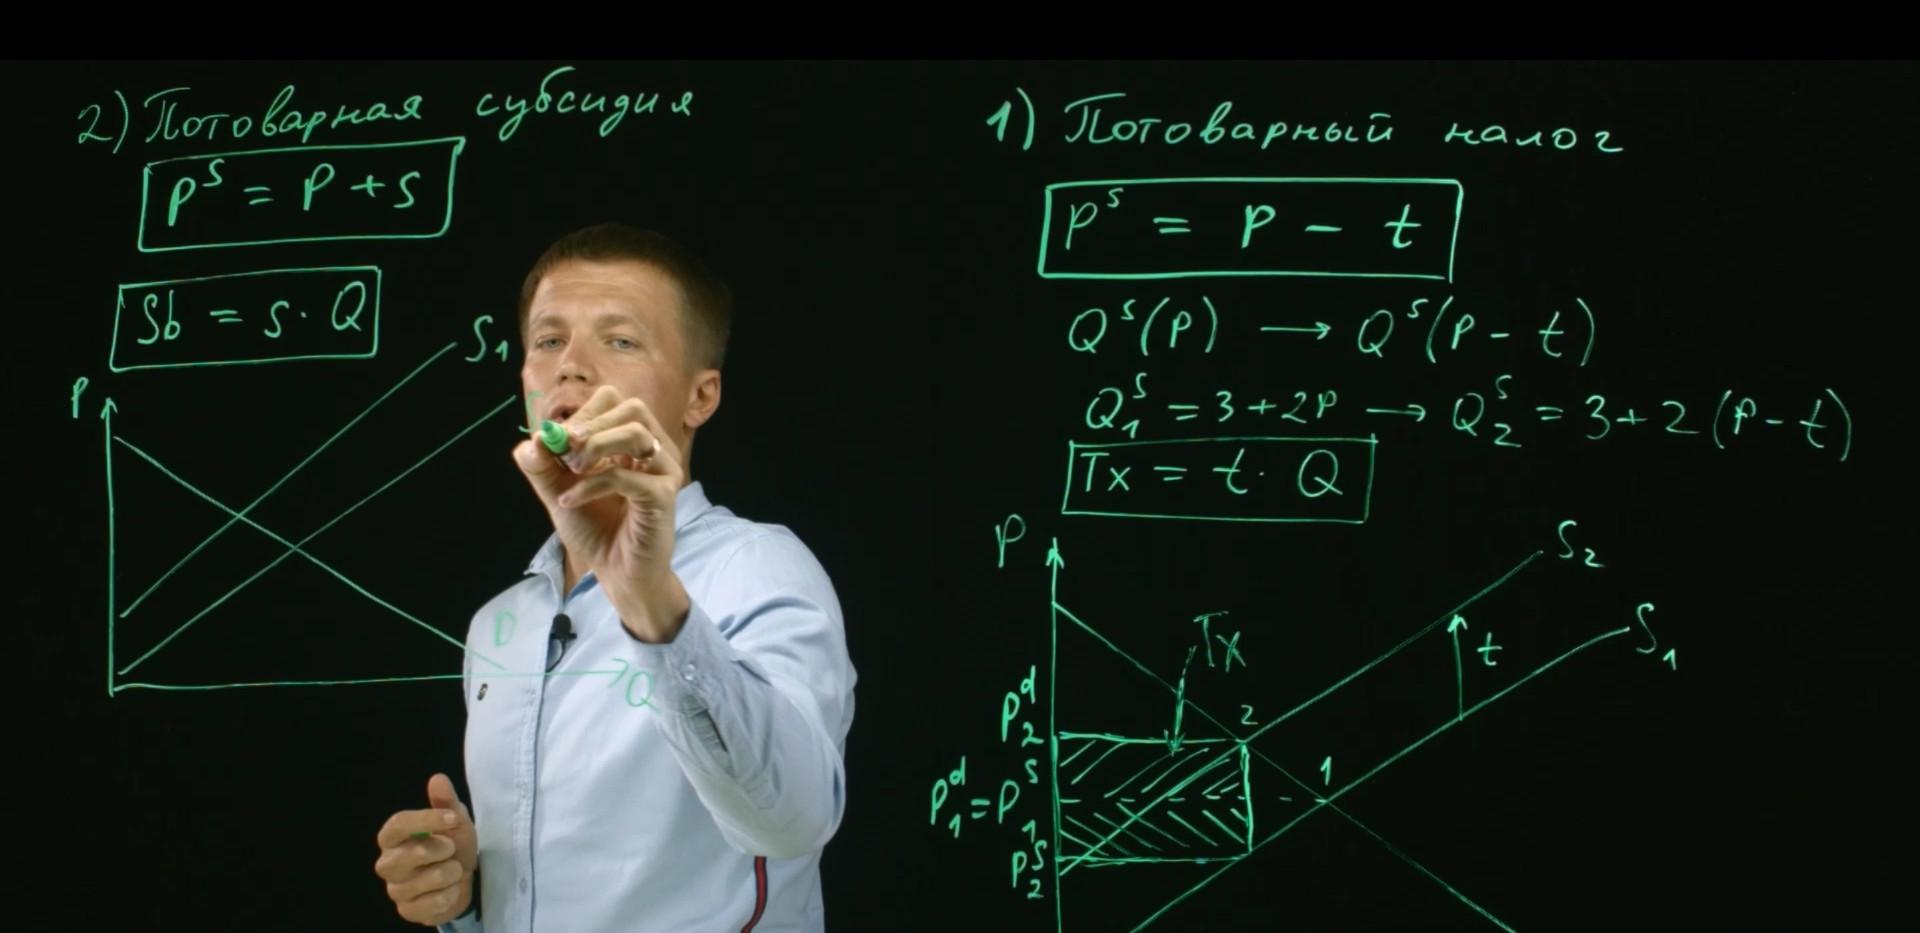 запись курсов для преподавателей.jpg